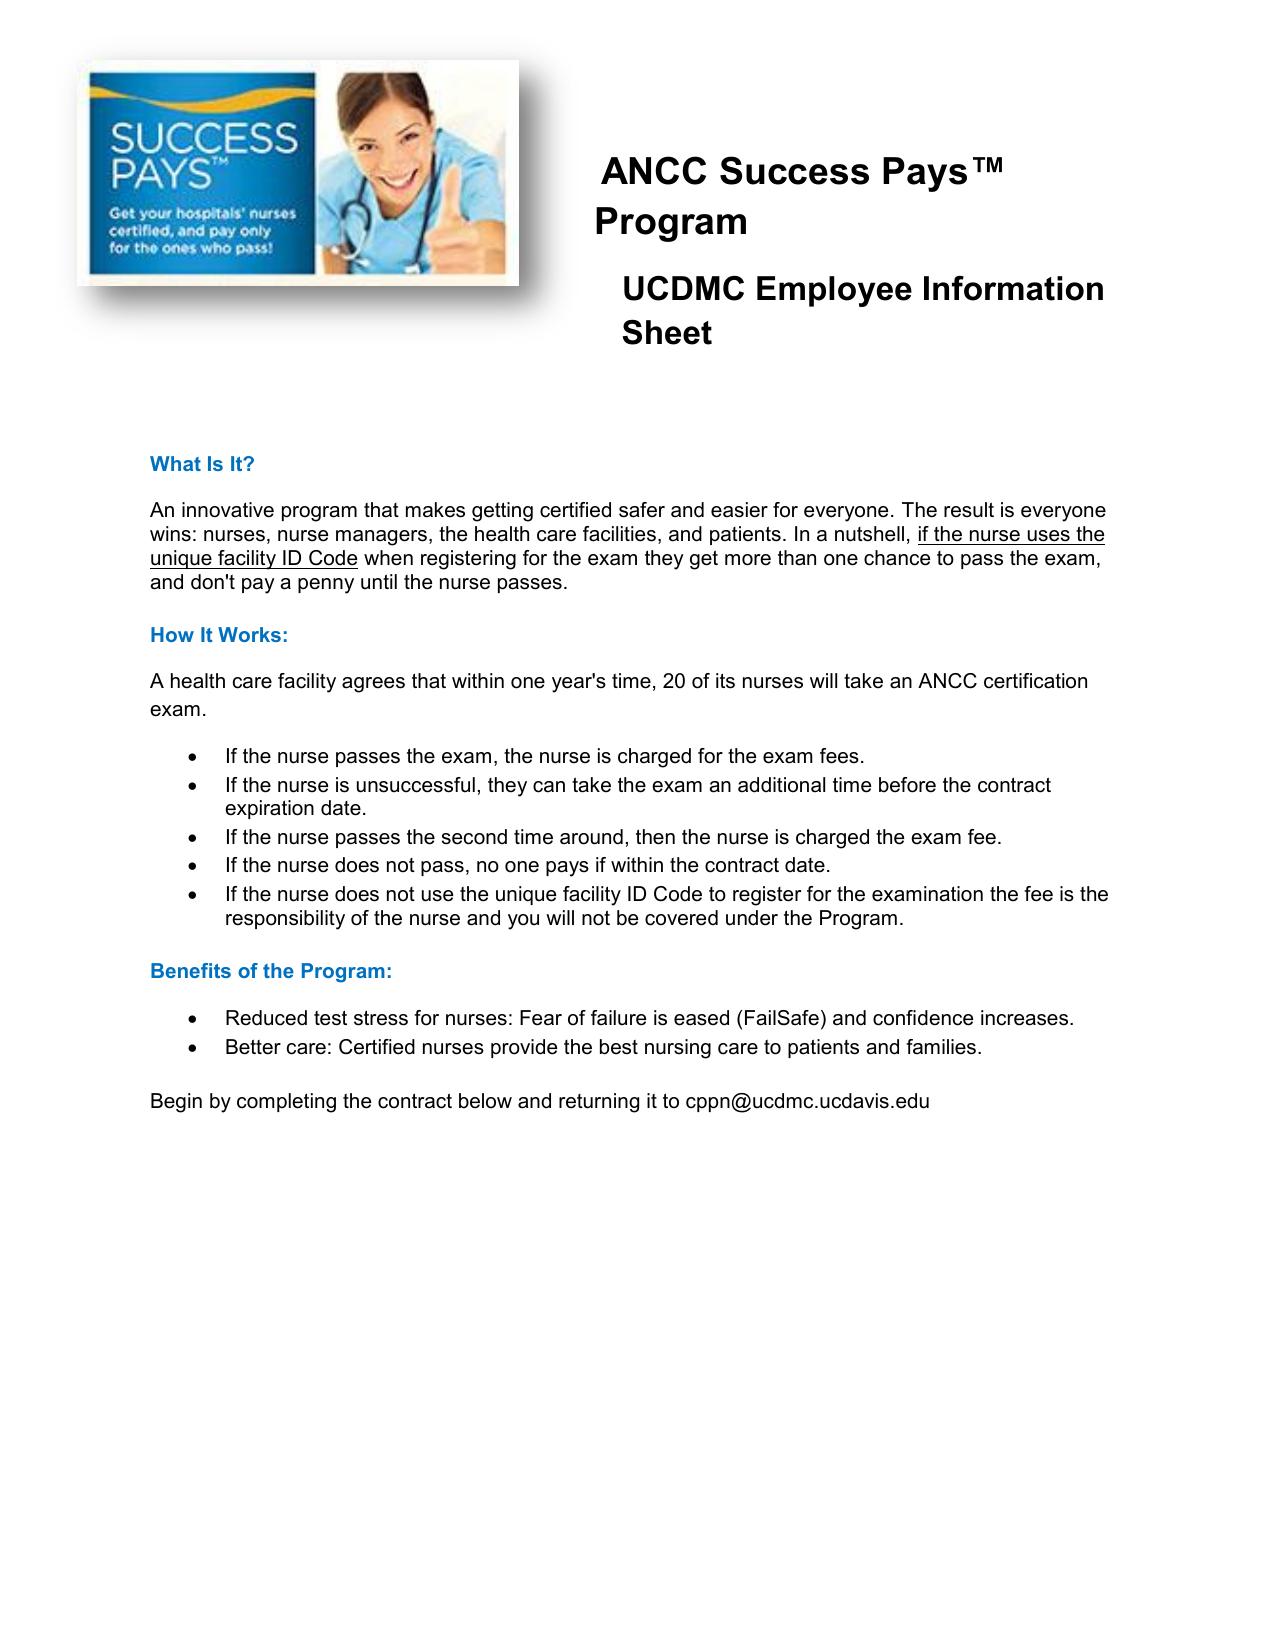 ancc success pays™ program ucdmc employee information sheet